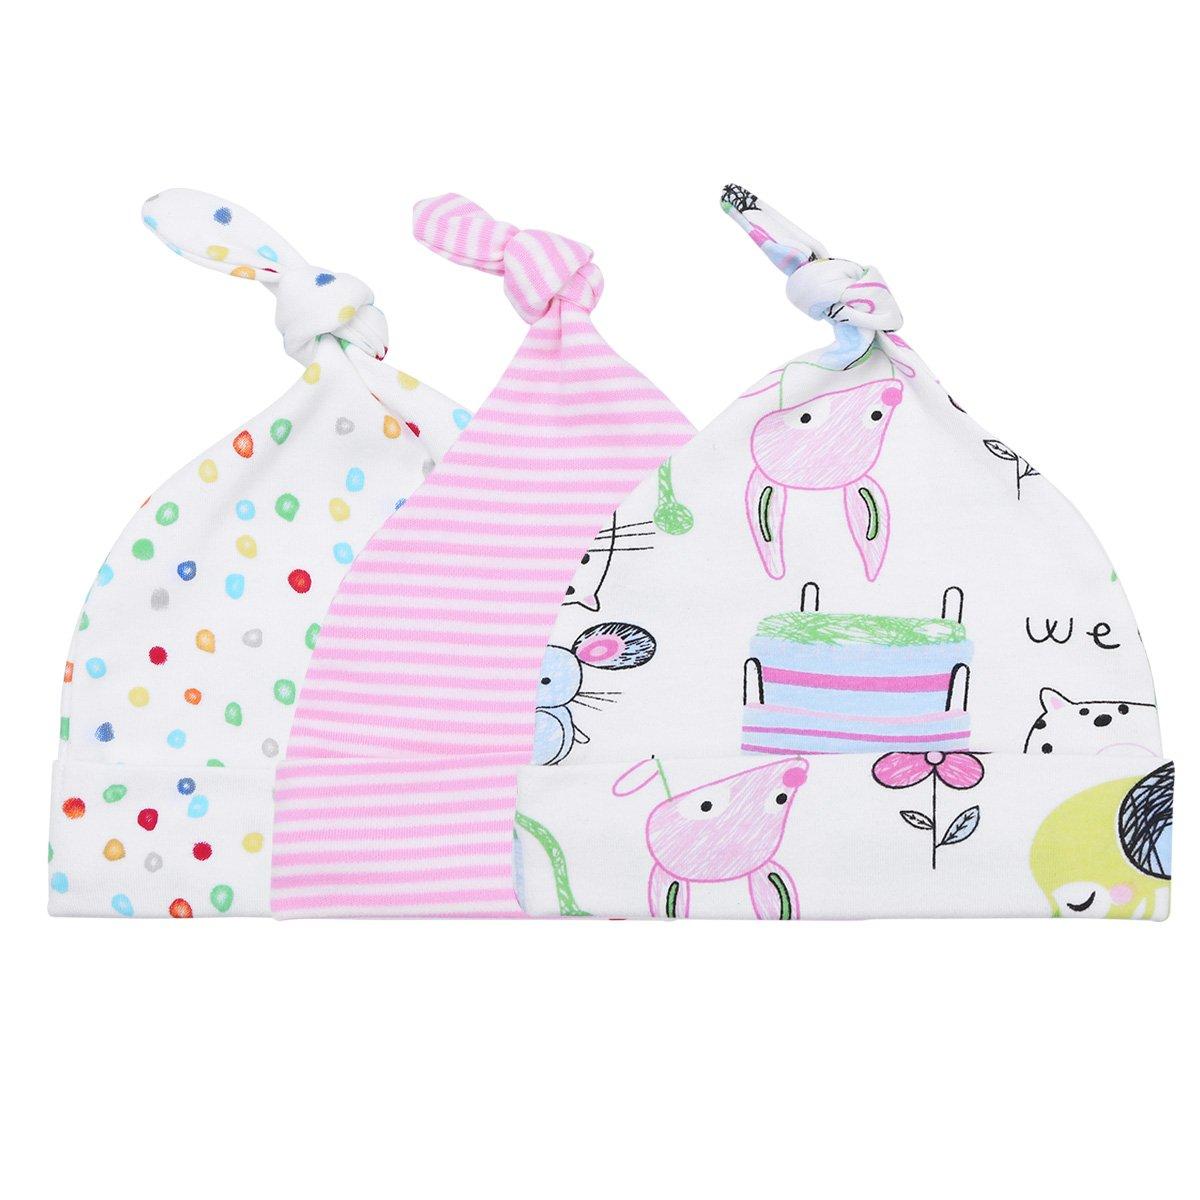 TiaoBug Unisex Newborn Infant Baby Boys Girls Hats Soft 100% Organic Cotton Beanie Hospital Caps T10054043-10053178-UK